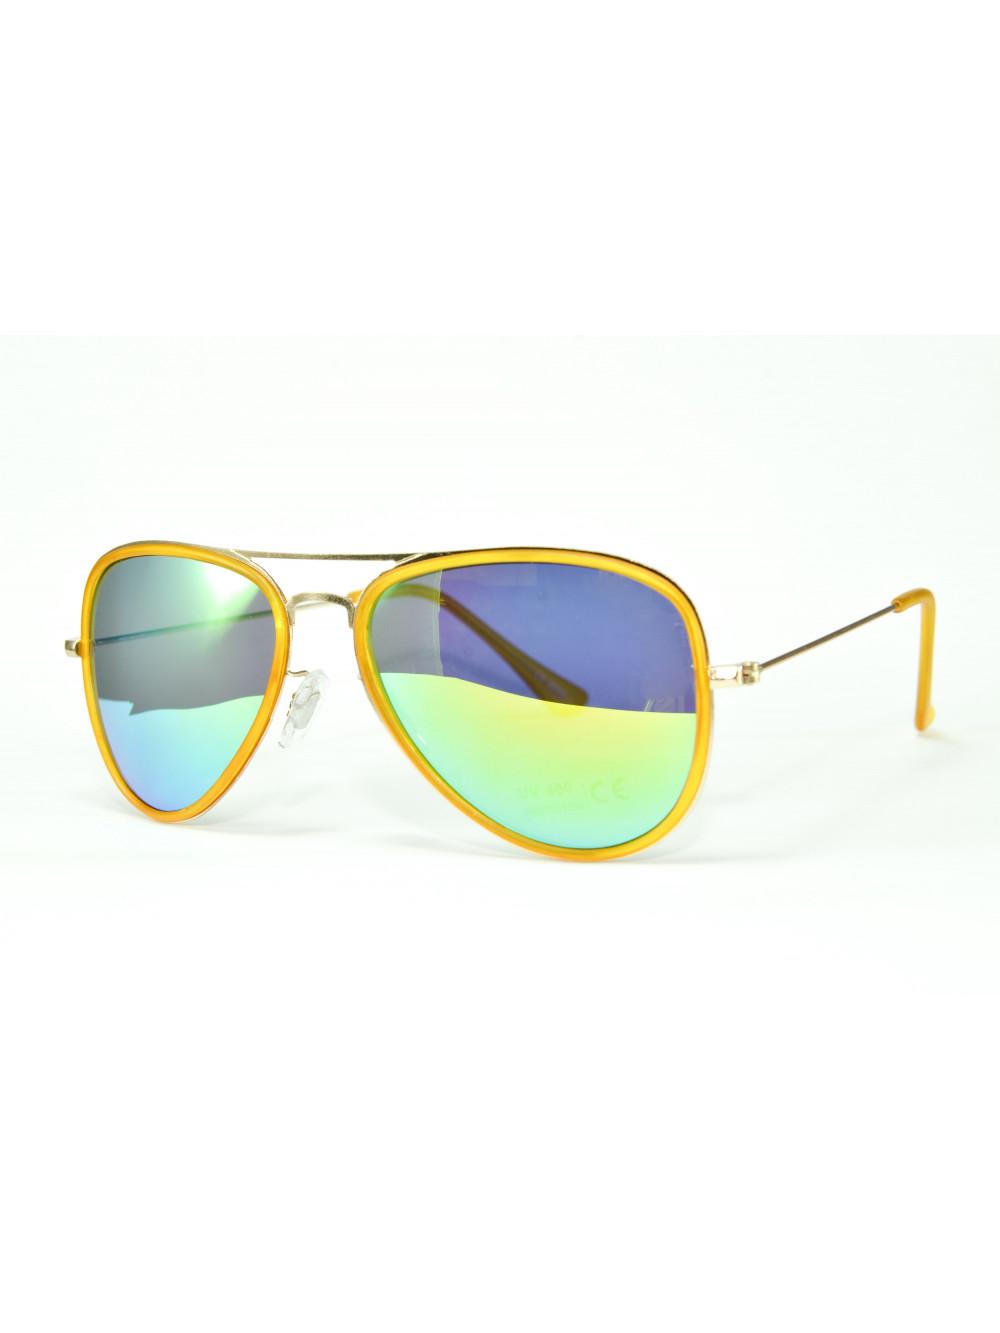 Slnečné okuliare Aviator Pilot XS Yellow